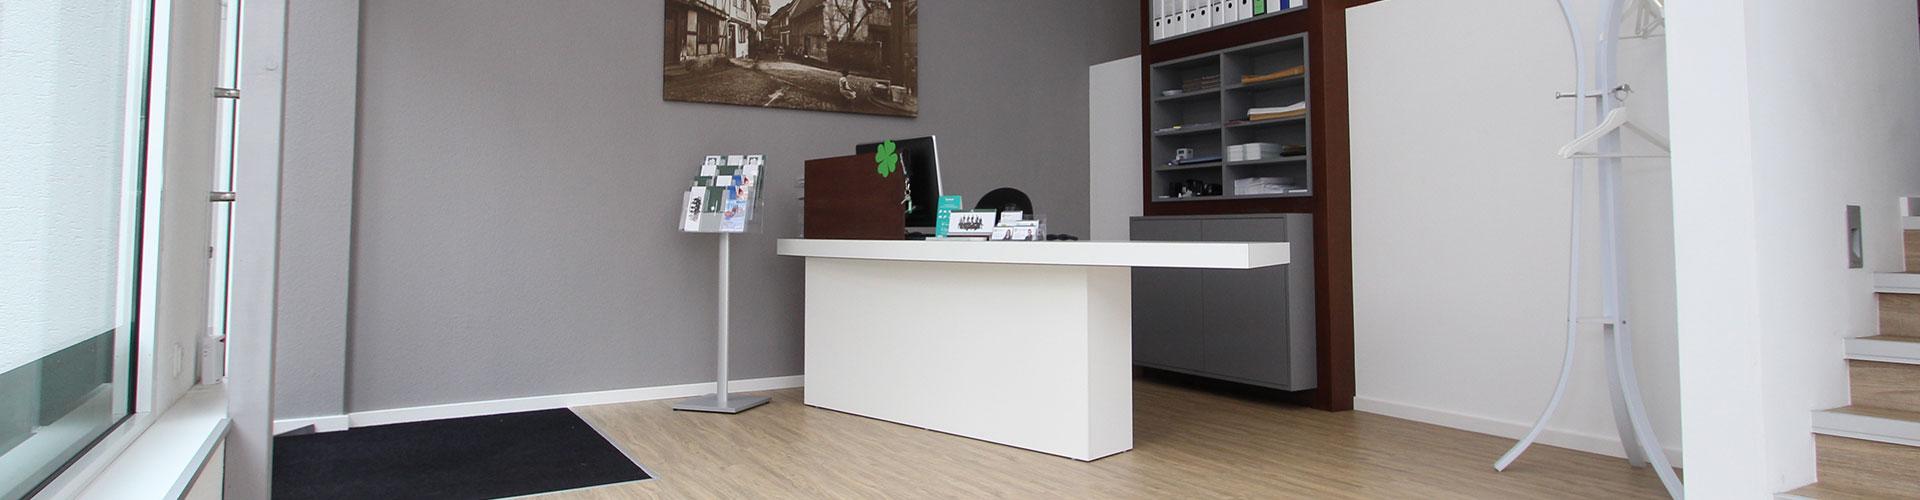 BERK Immobilien Büro Seligenstadt